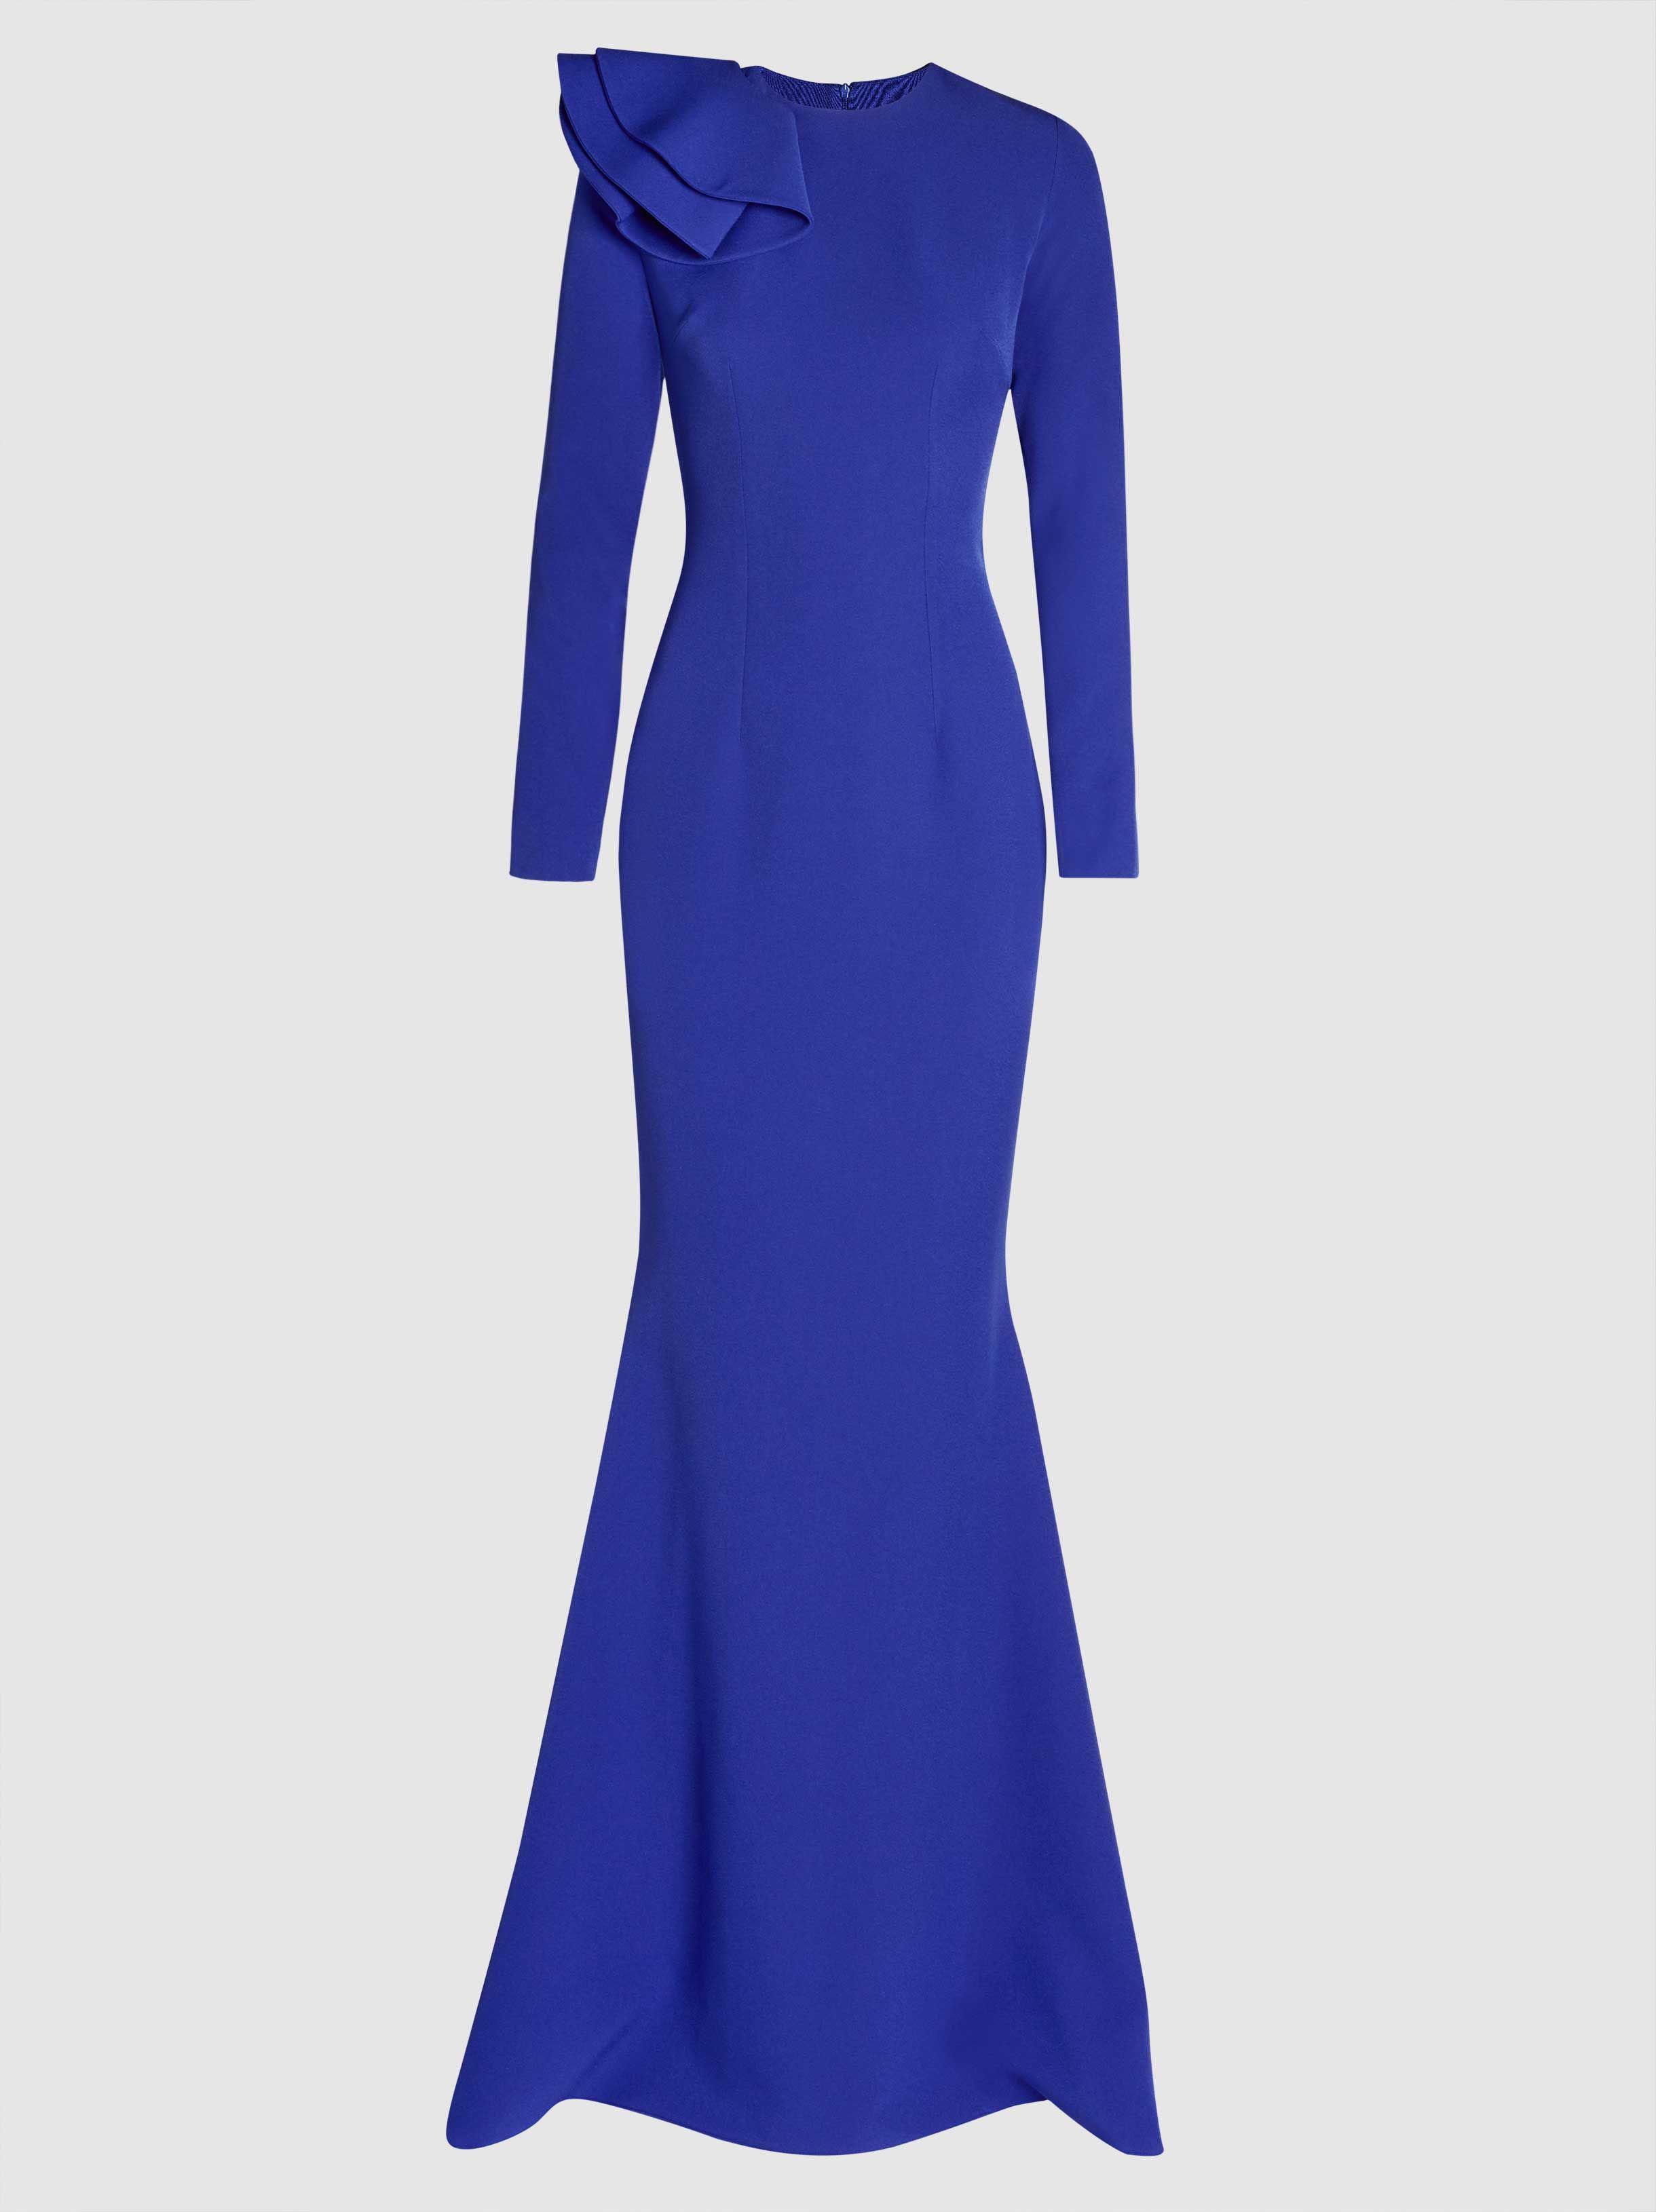 Lyst - Safiyaa Doniya Long-sleeved Crepe Gown in Blue